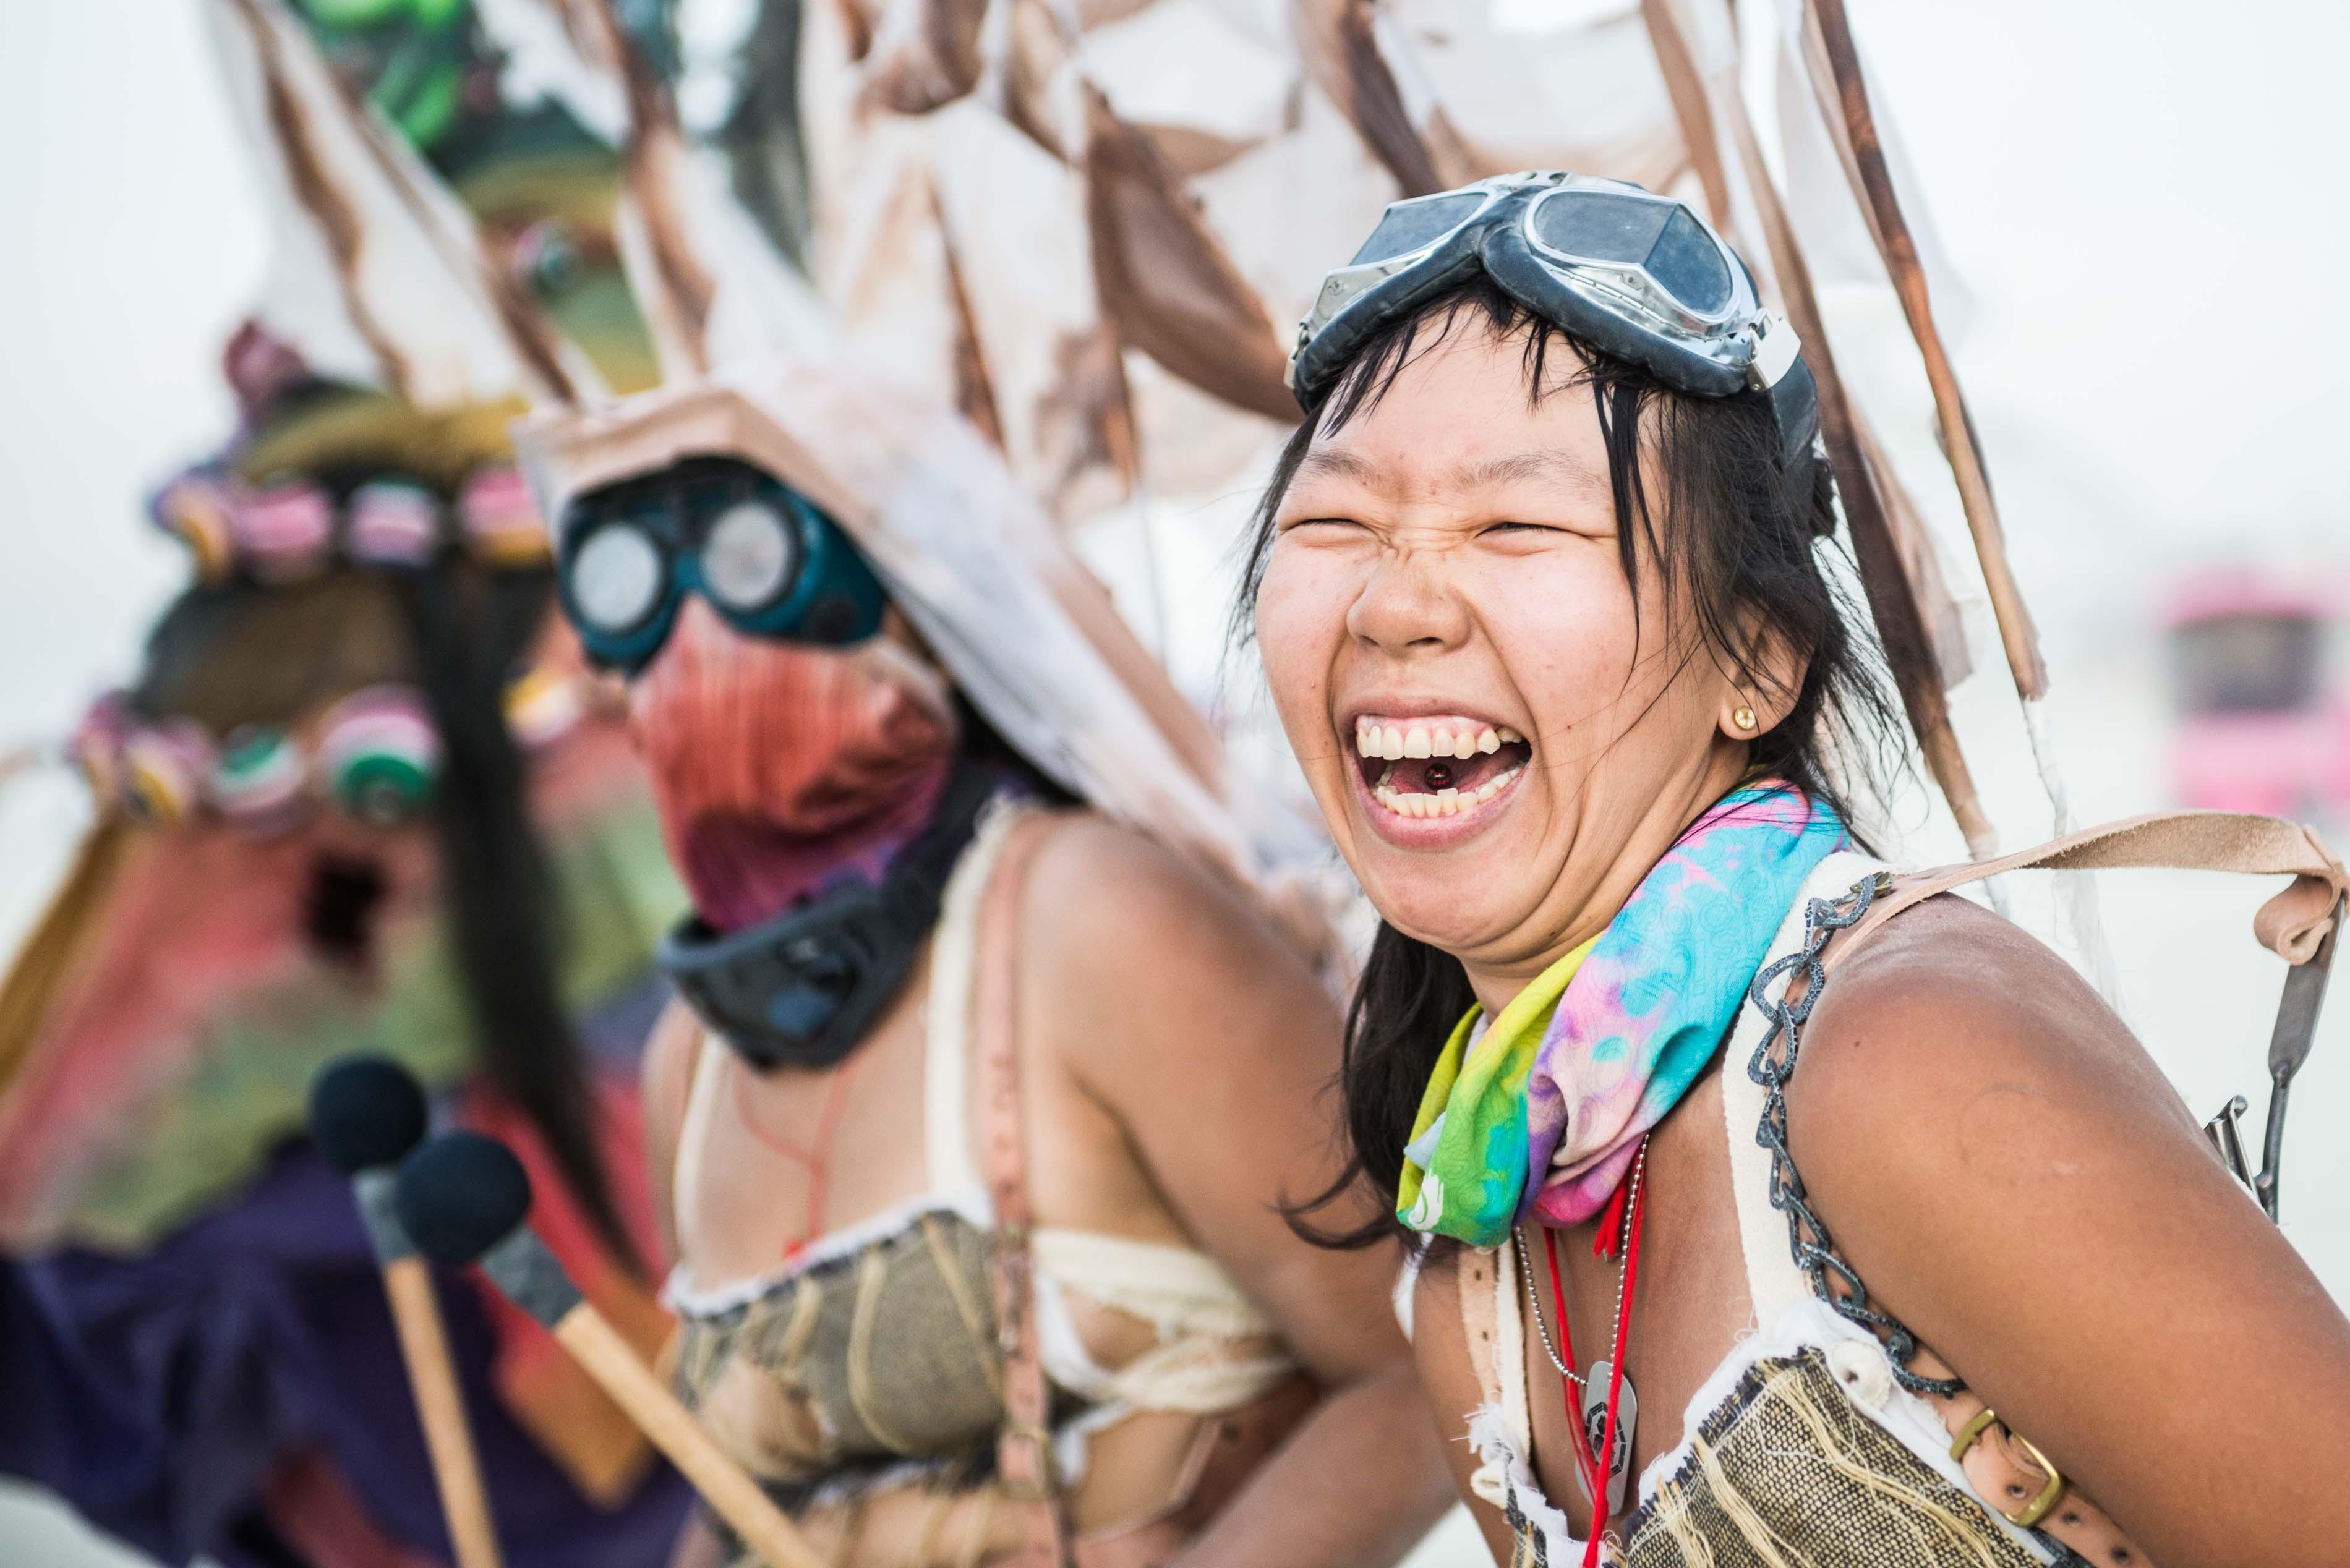 These photos capture the desert utopia of Burning Man : Adventure.com